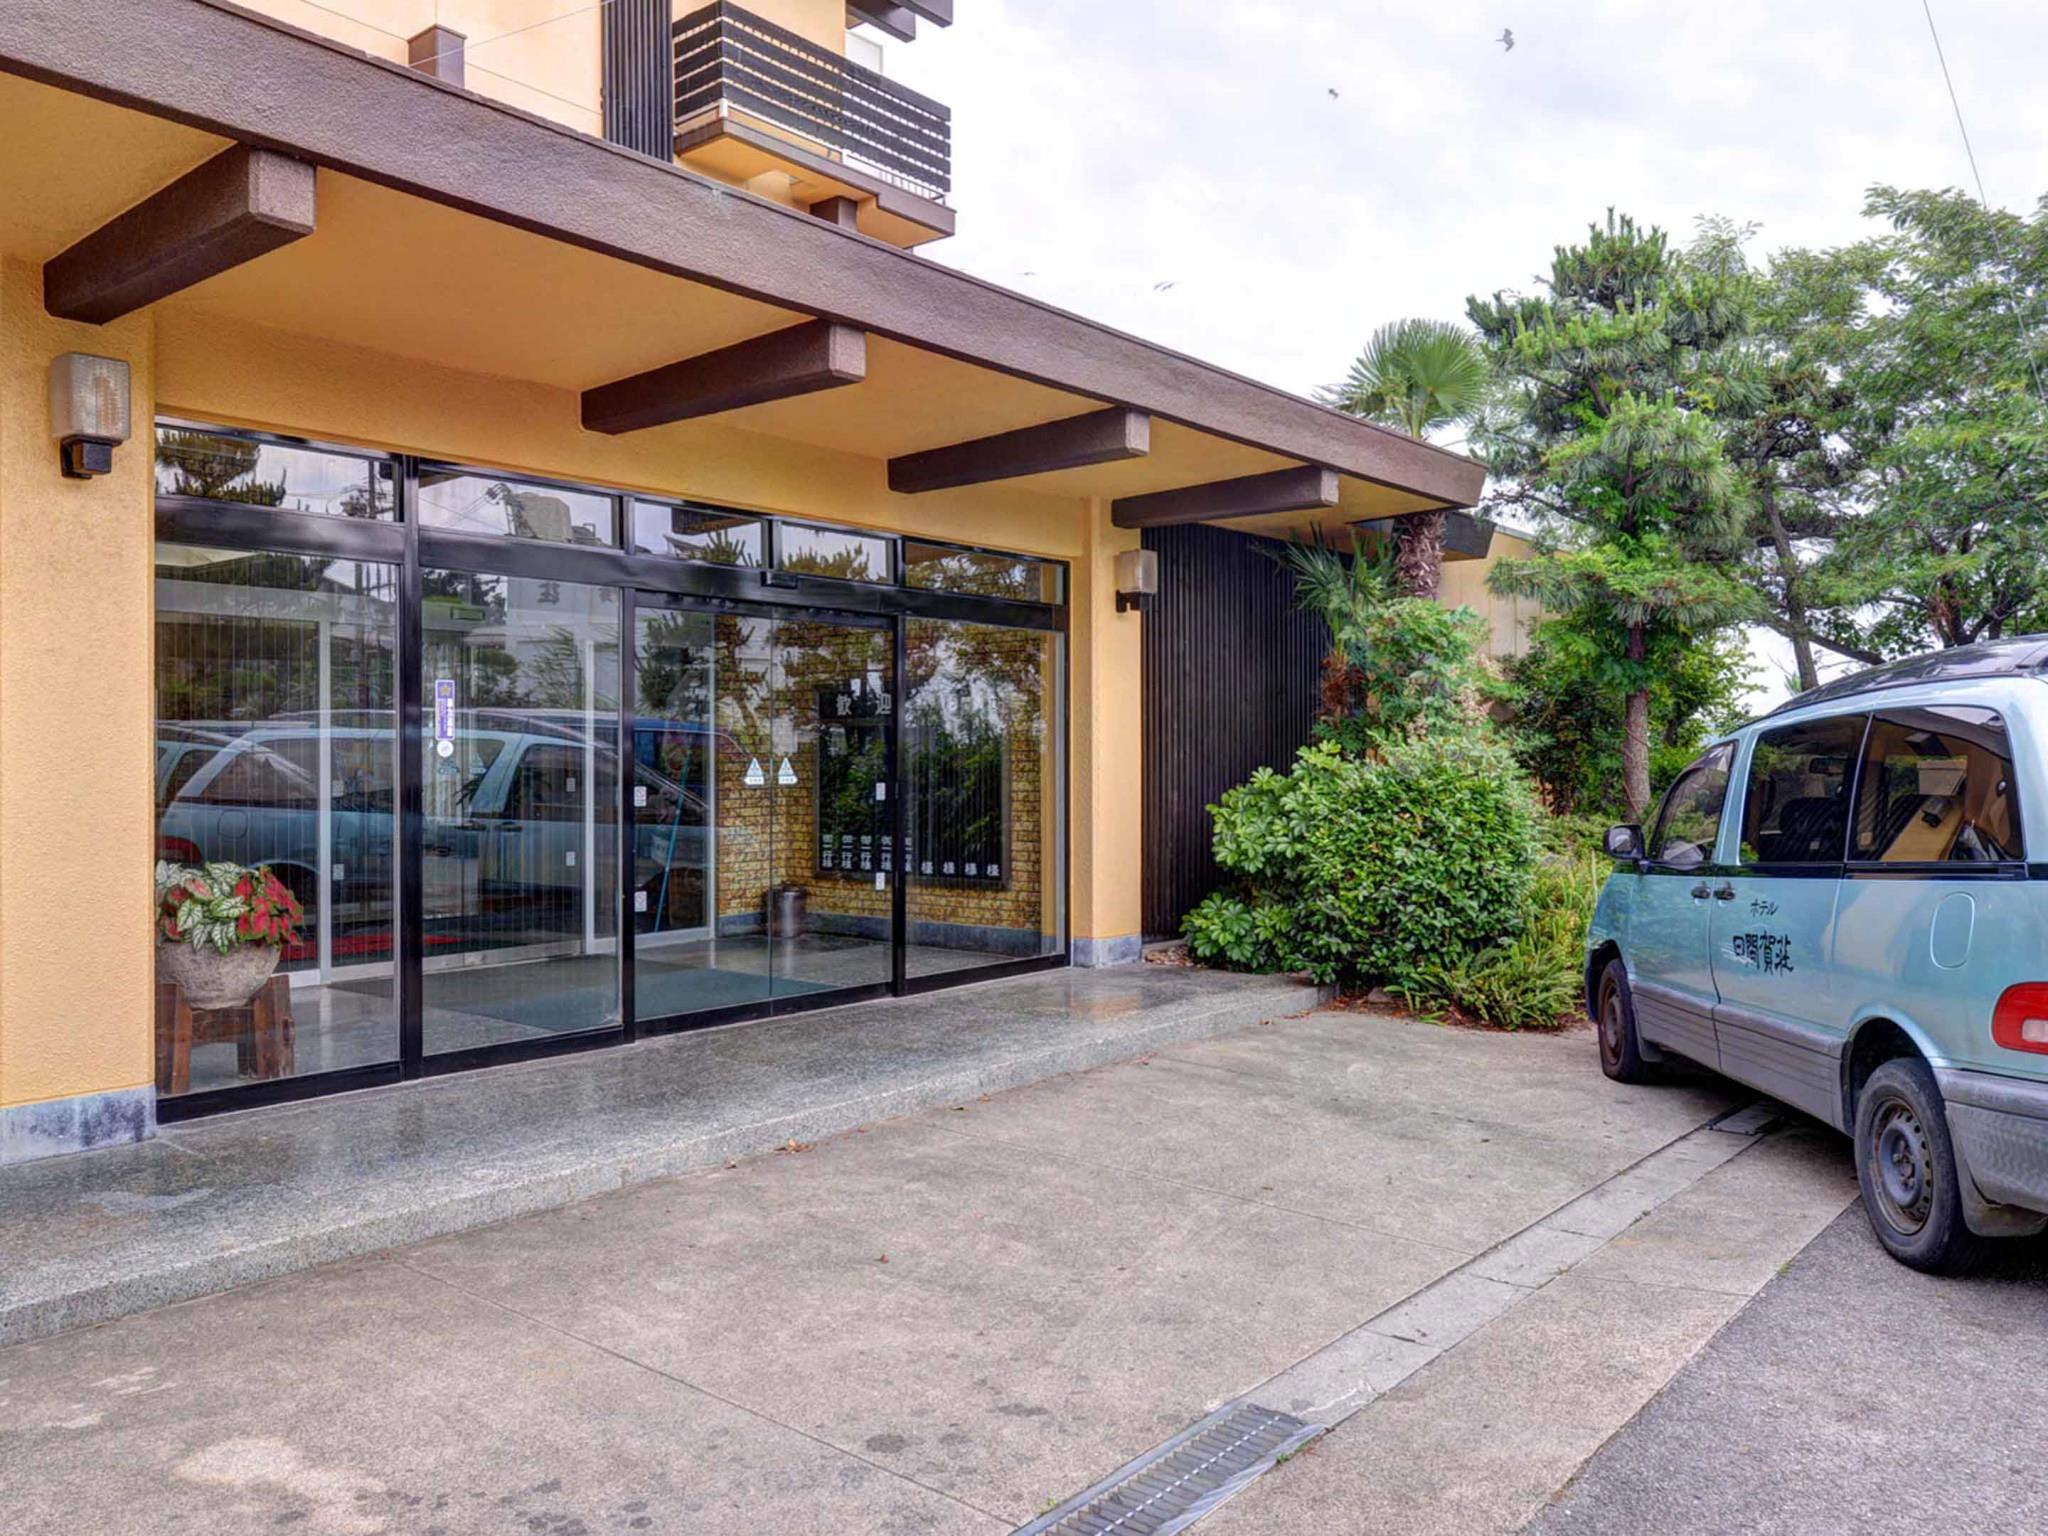 Hotel Himakasou 日间贺莊别墅酒店